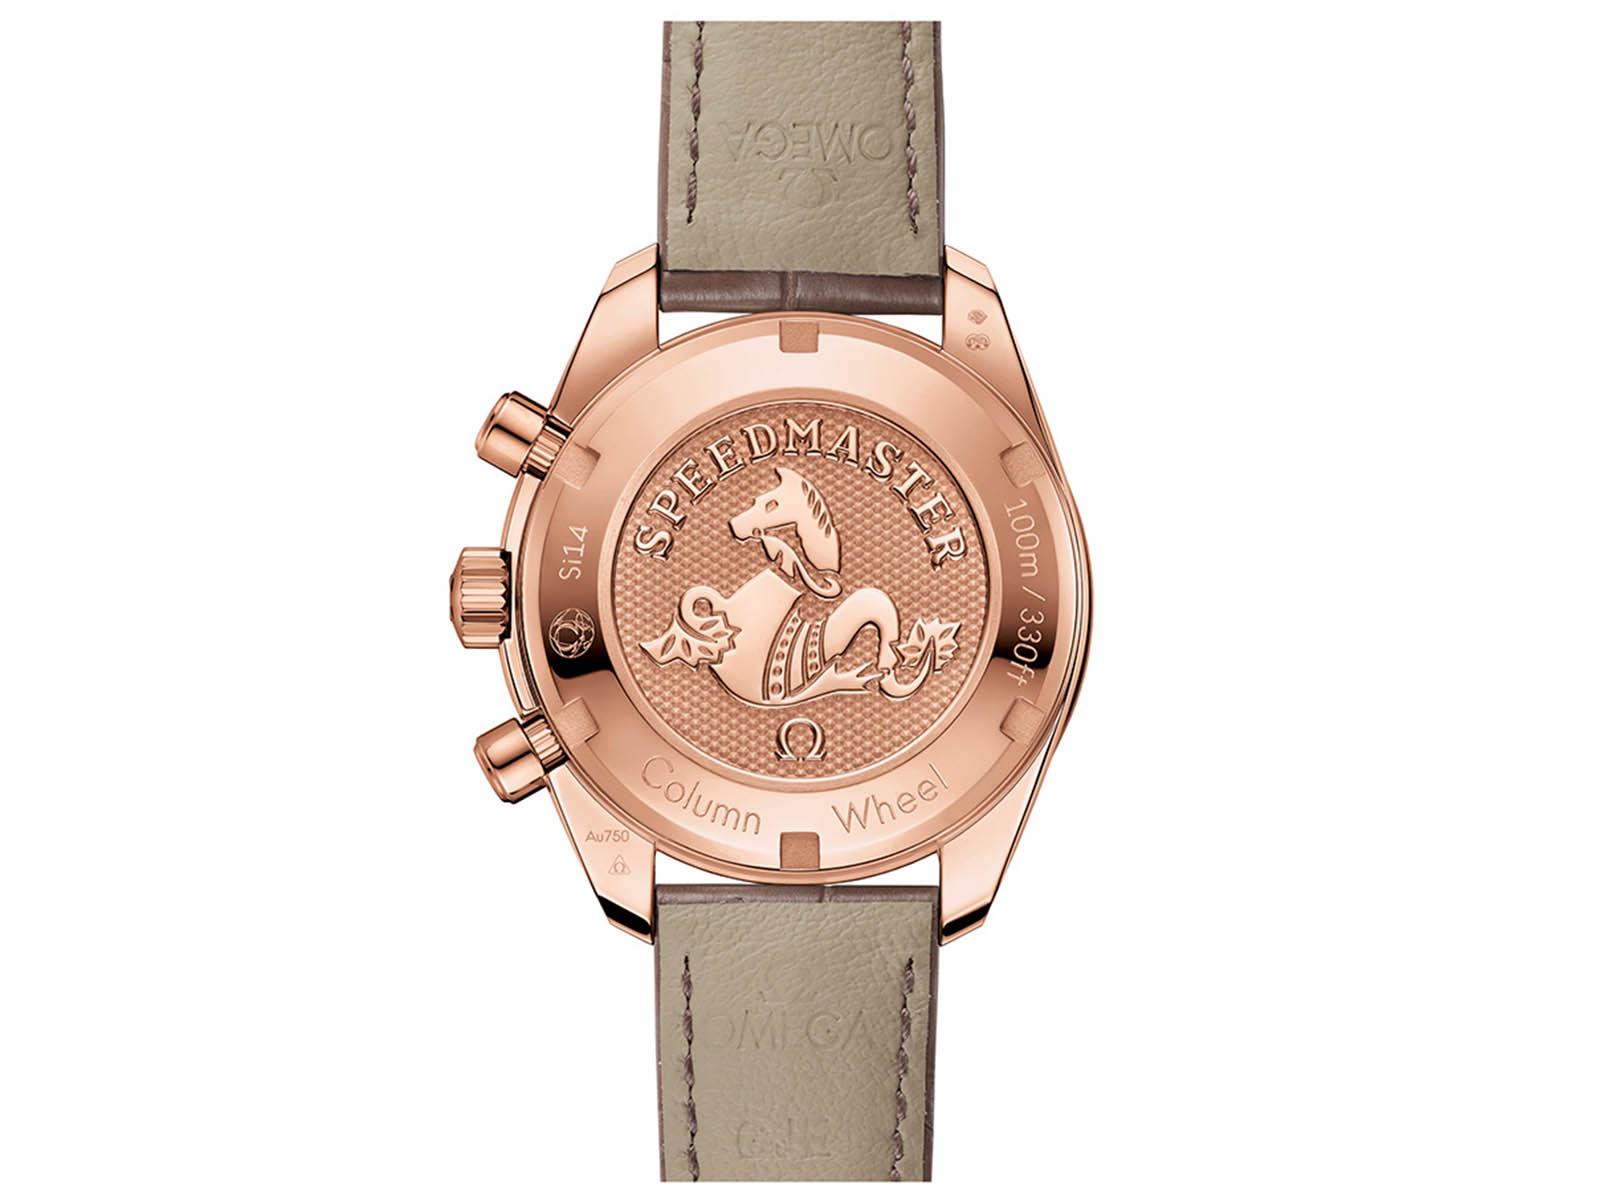 324-68-38-50-02-003-omega-speedmaster-38-co-axial-chronograph-38mm-sedna-gold-diamond-8.jpg